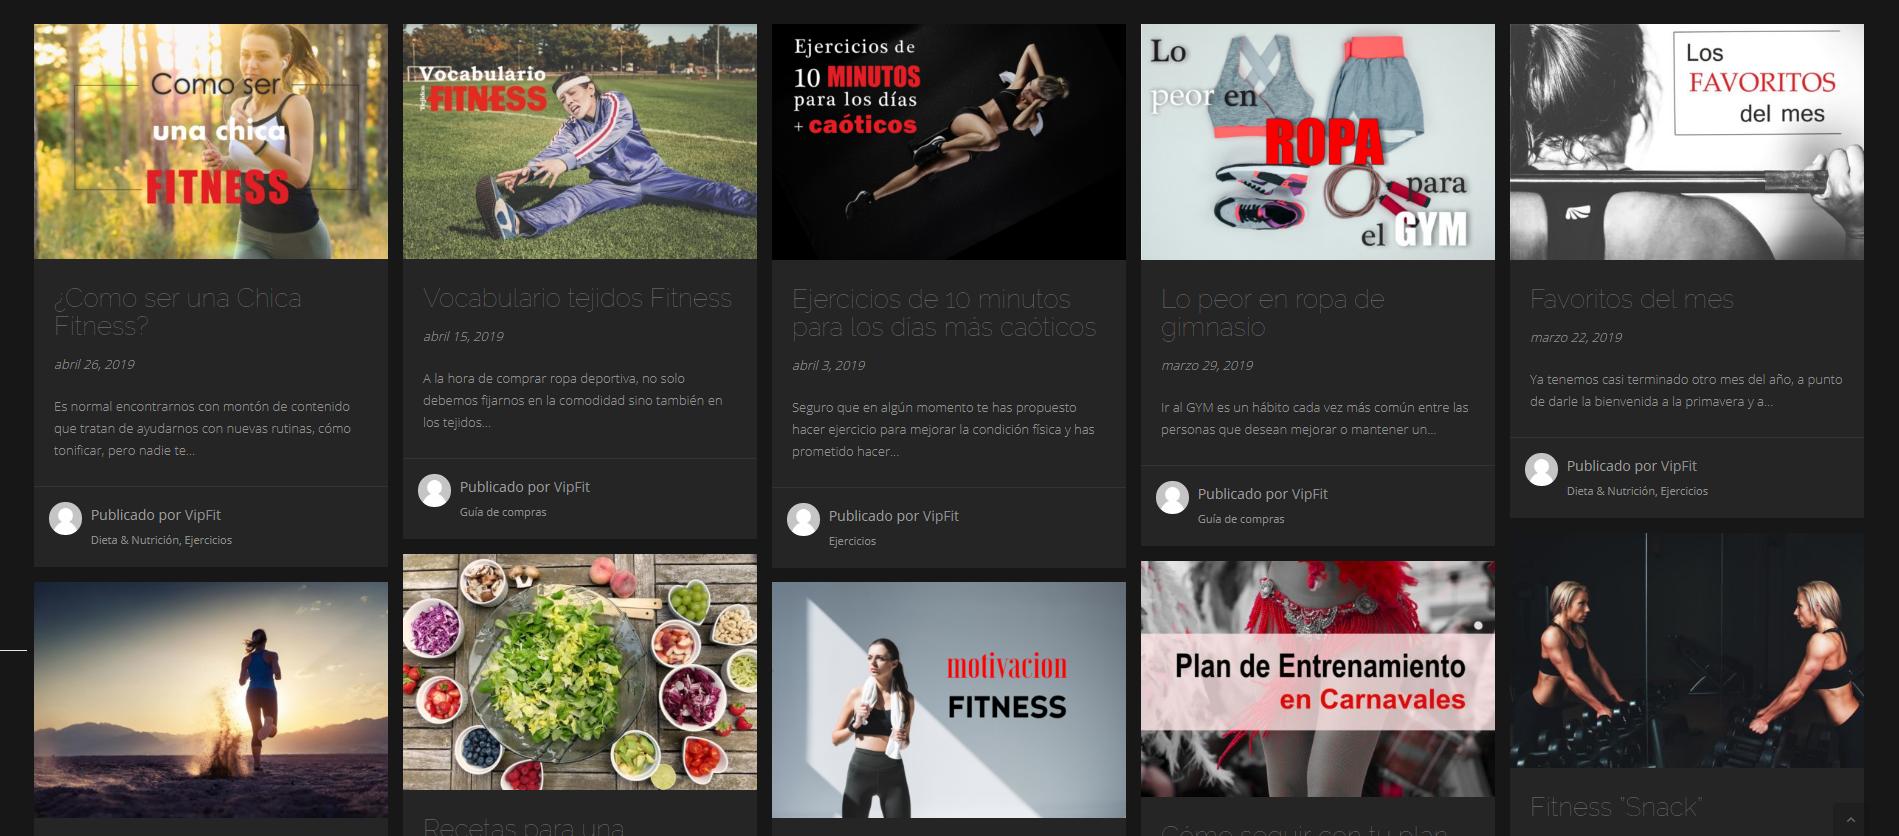 Blog Vip fit